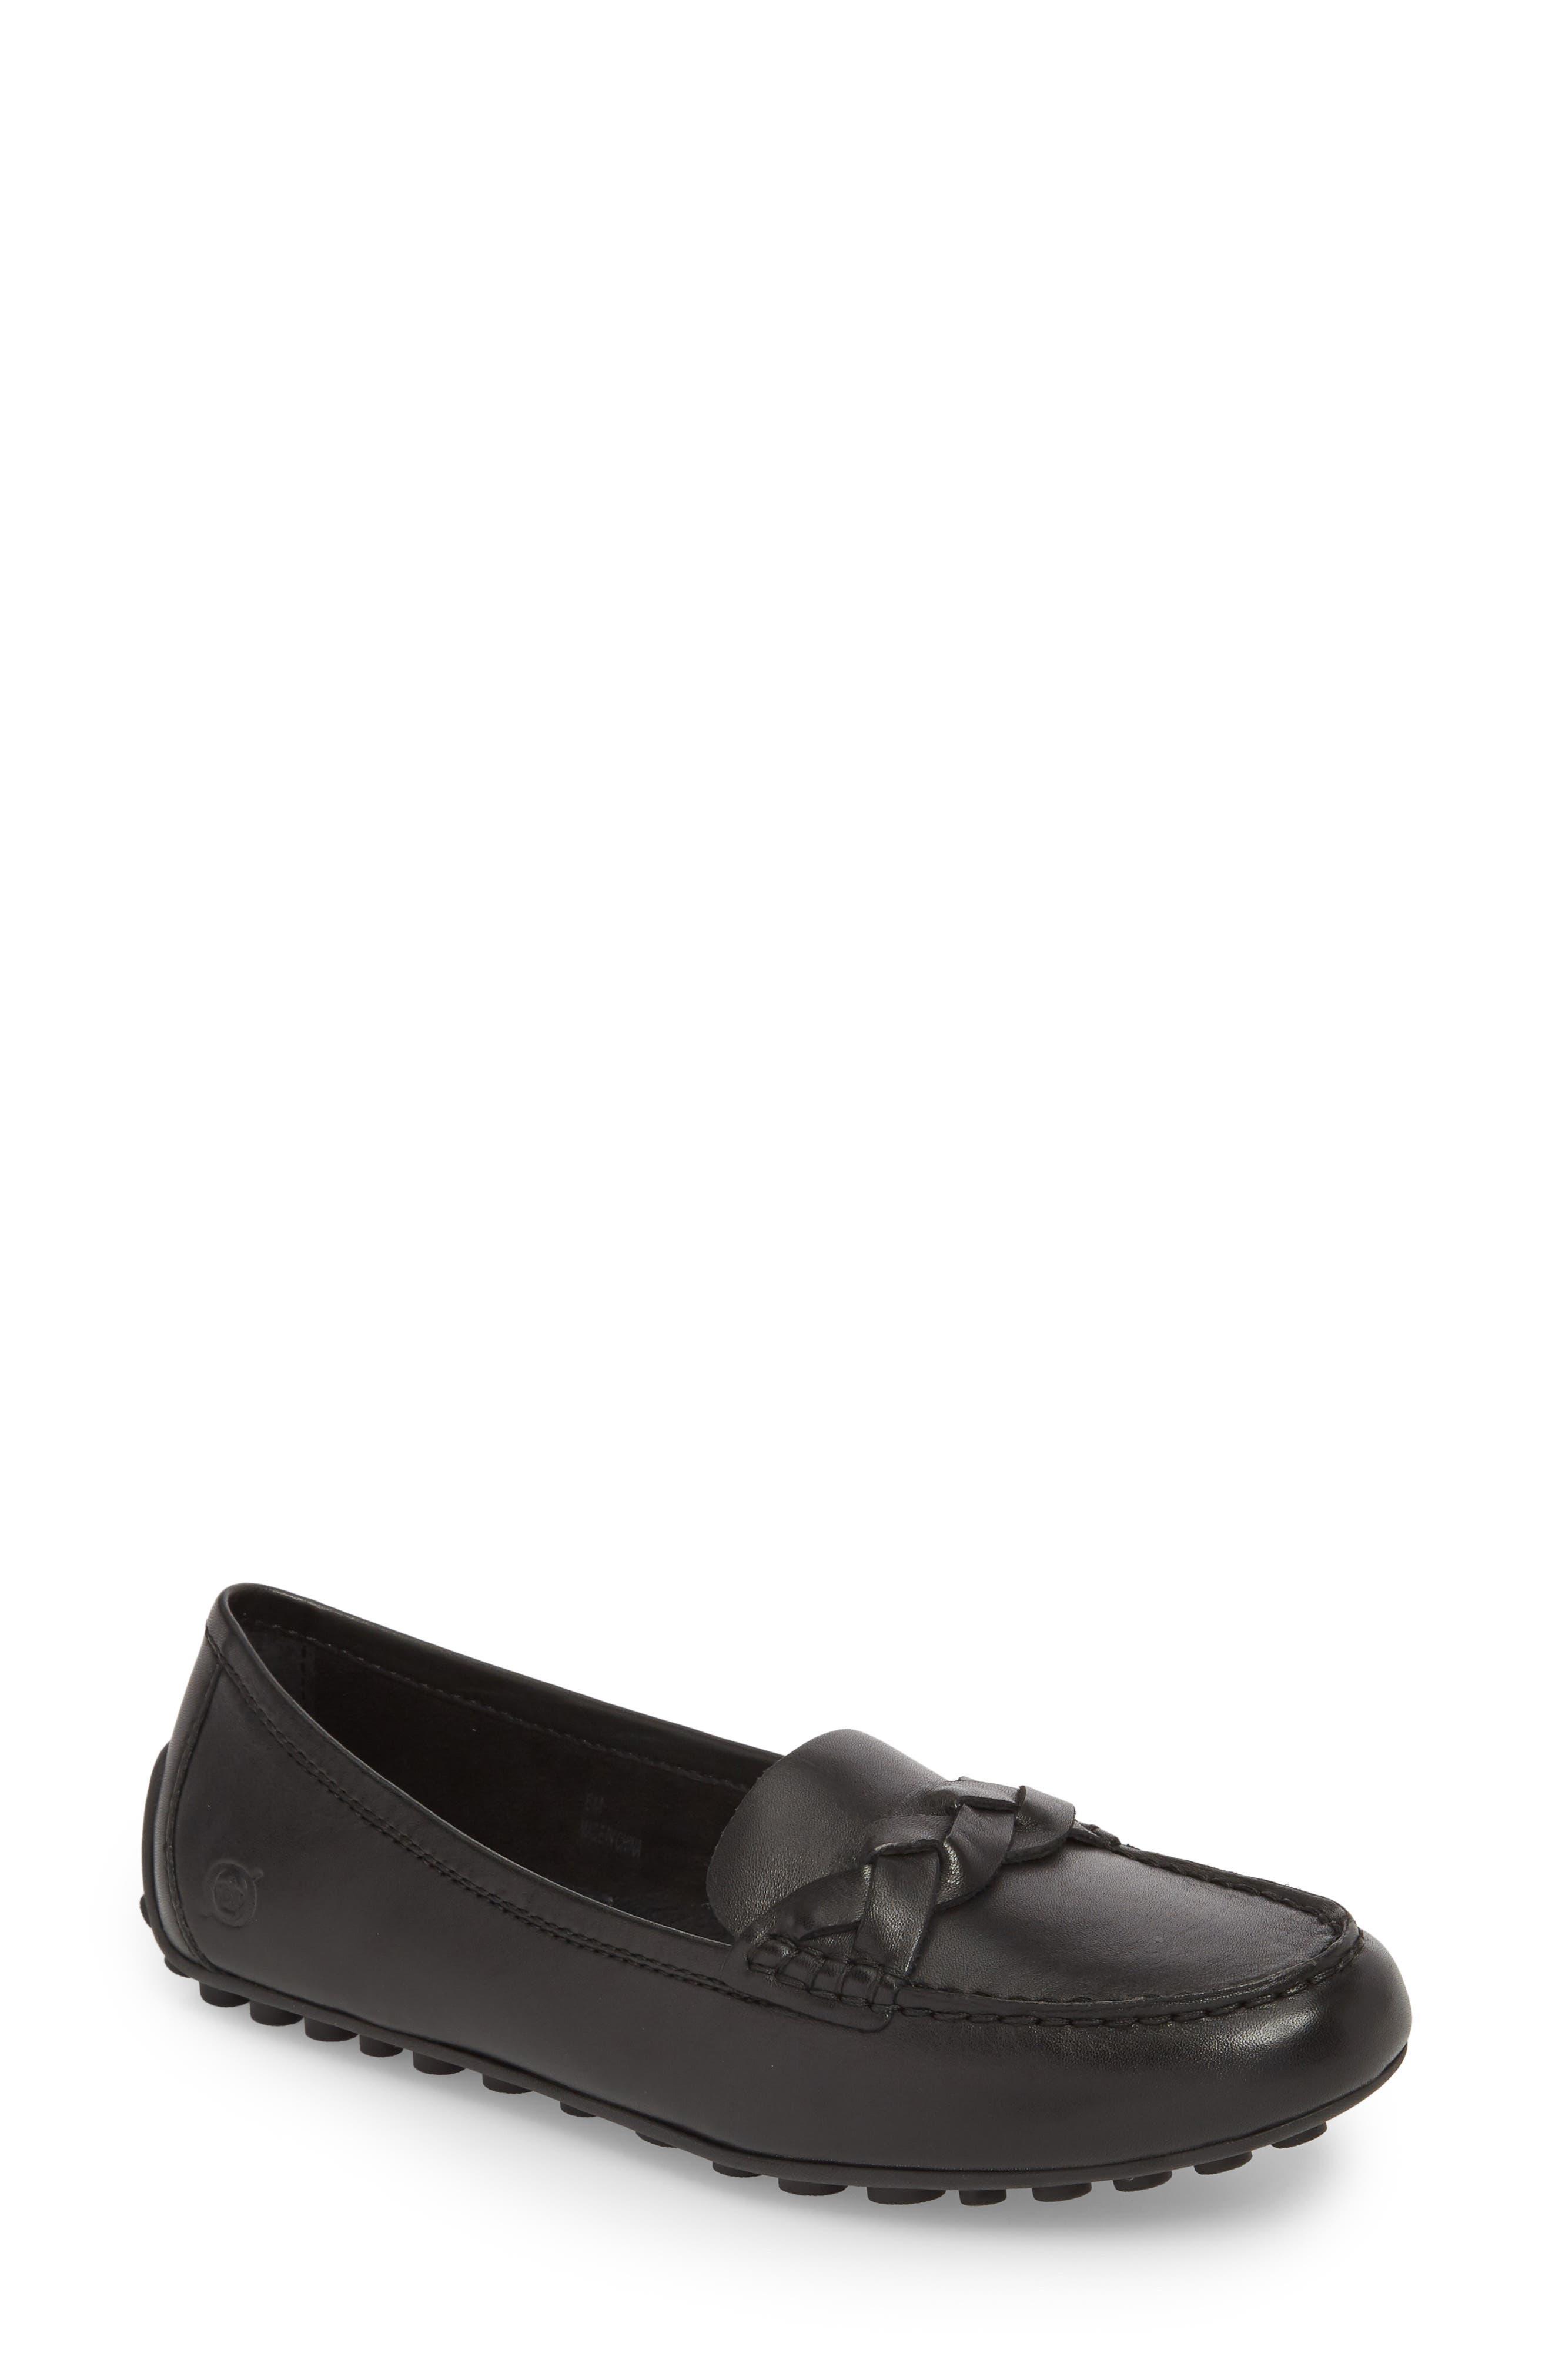 Kasa Loafer,                         Main,                         color, BLACK LEATHER